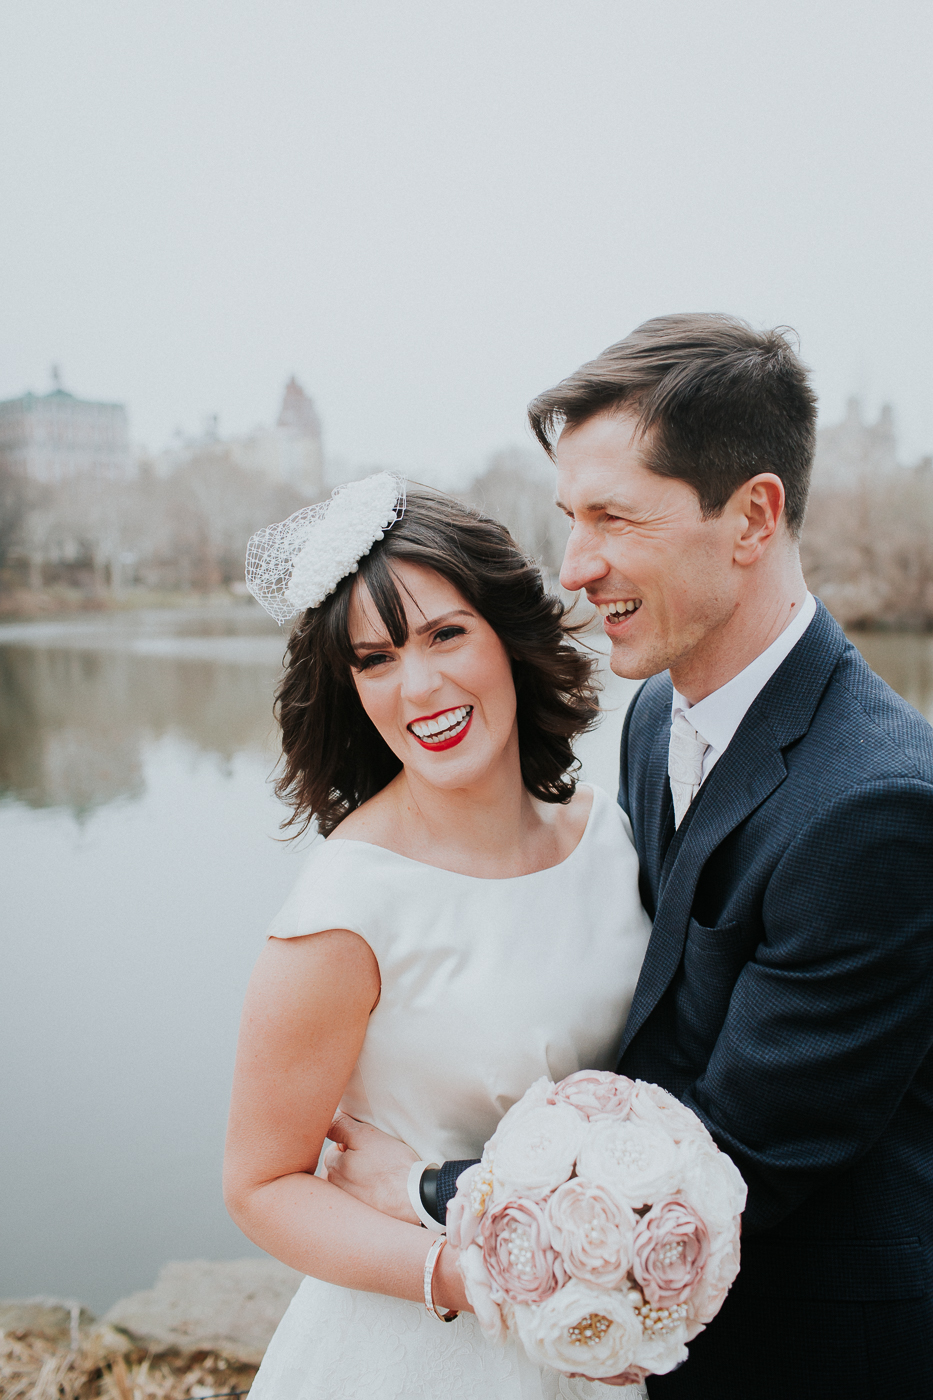 Ladies-Pavilion-Central-Park-NYC-Documentary-Elopement-Wedding-Photographer-51.jpg